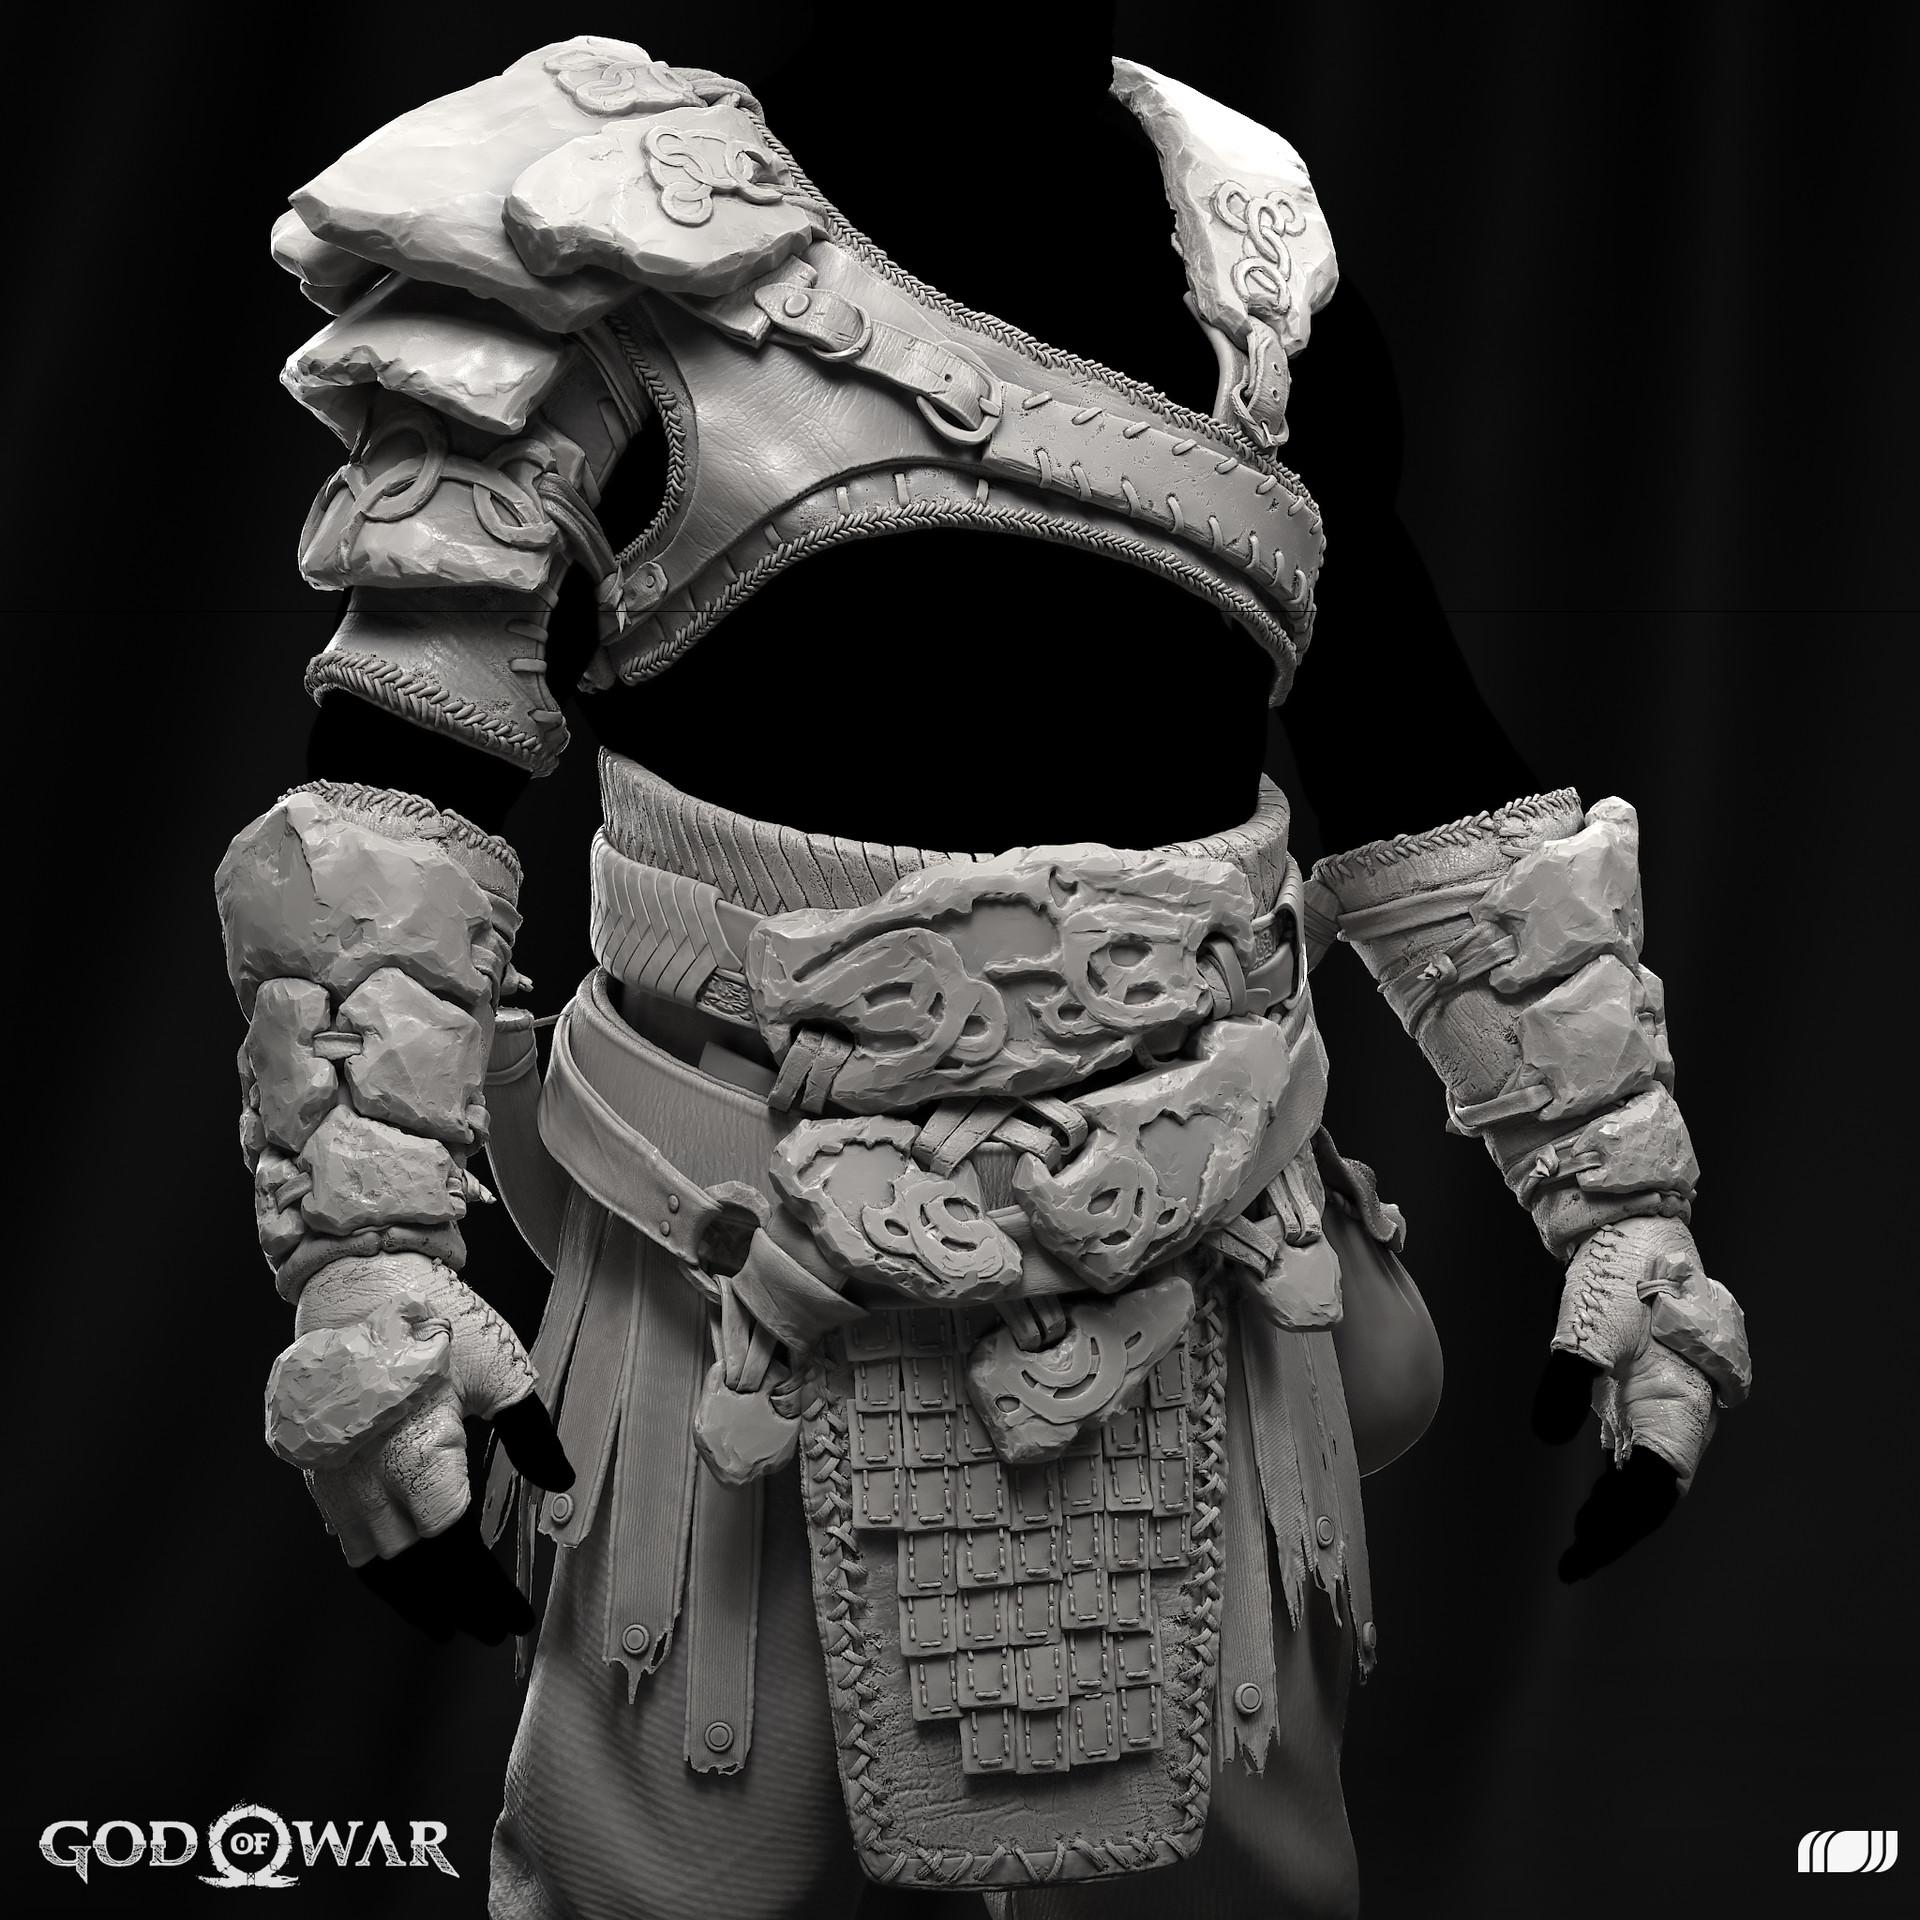 ArtStation - God Of War: Kratos Ancient armor set, Maxence Fleuret